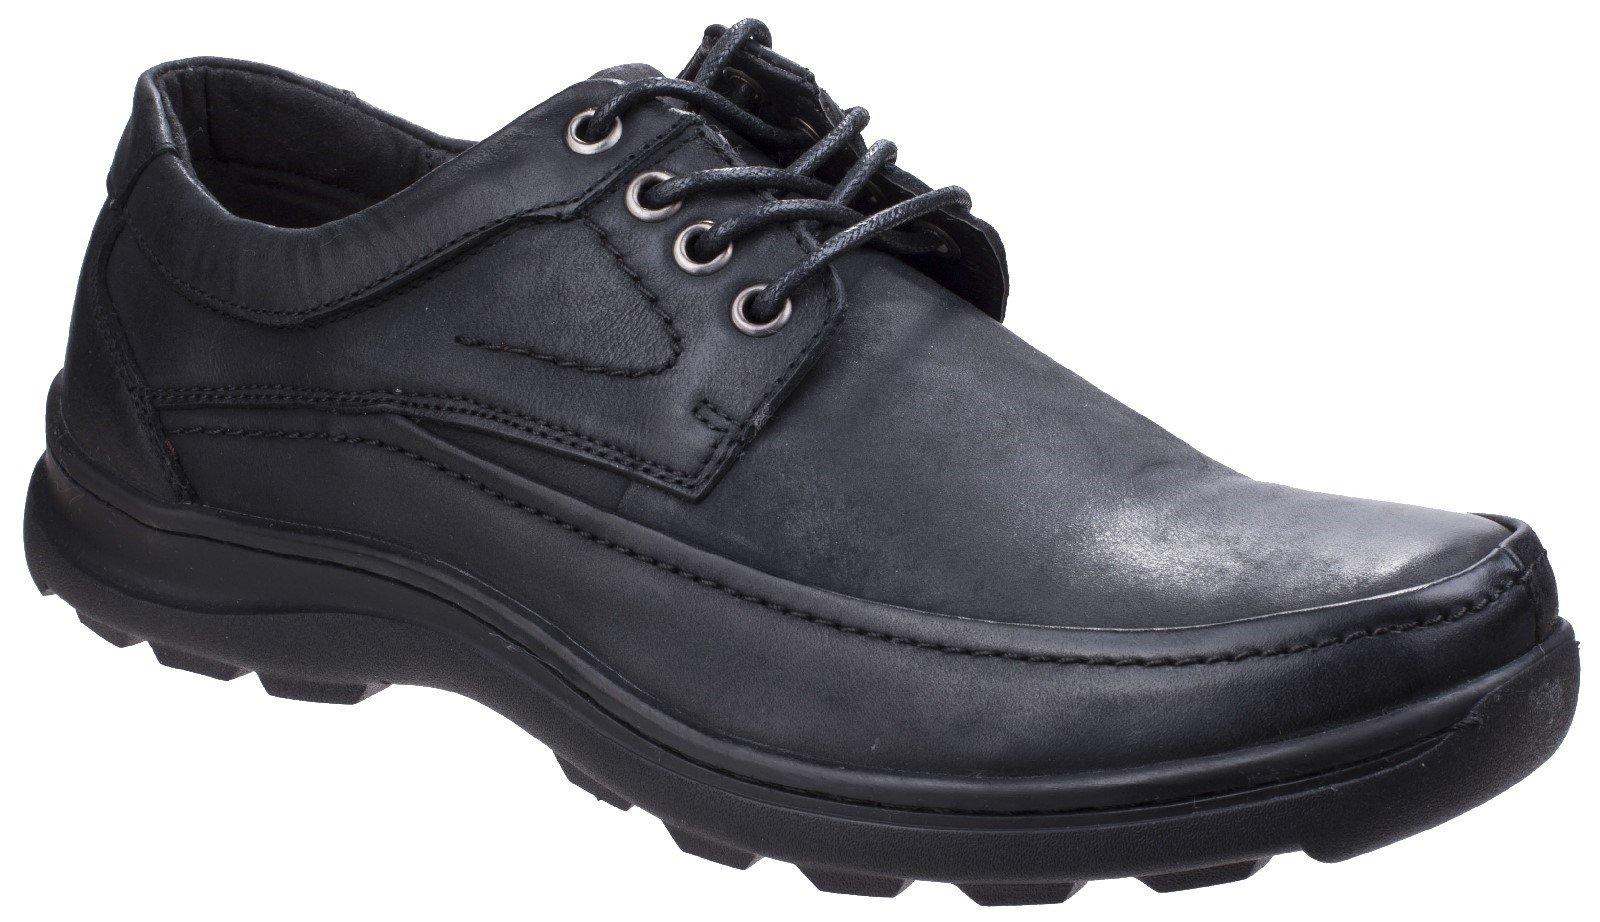 Fleet & Foster Men's Luxor Lace Up Shoe Black 26313-43921 - Black 7